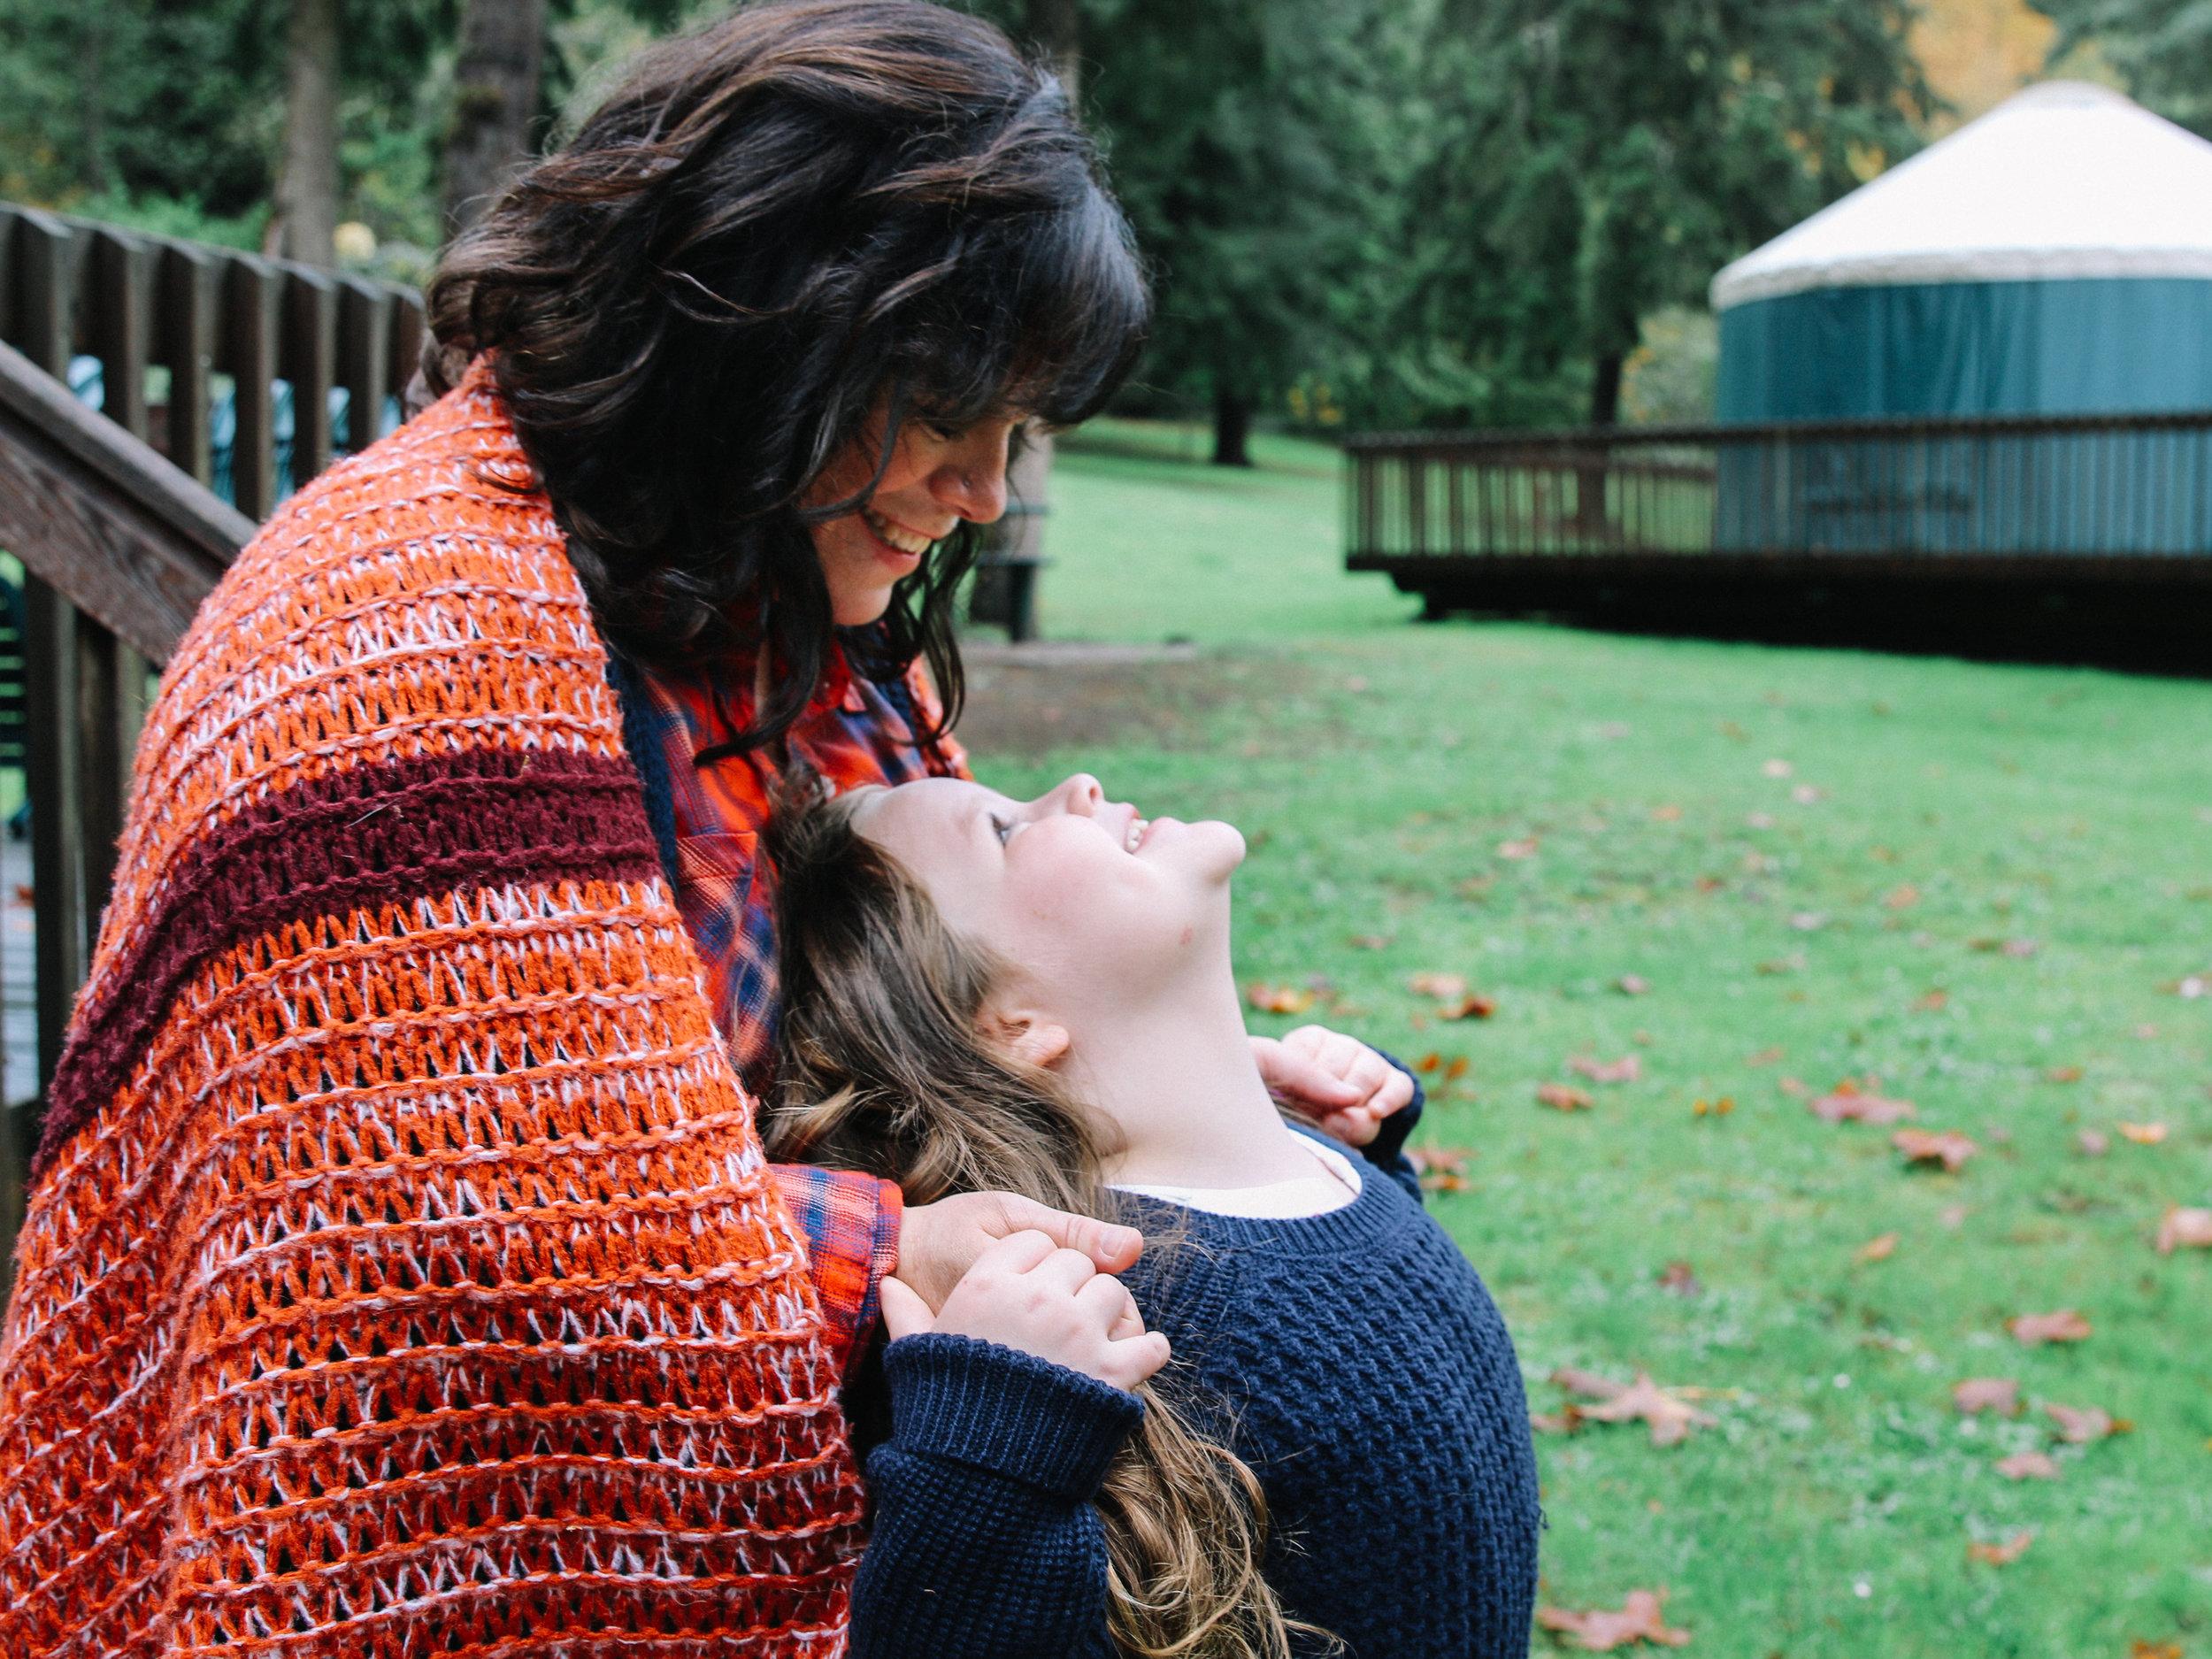 Lyndee+Marybella'16-42.jpg